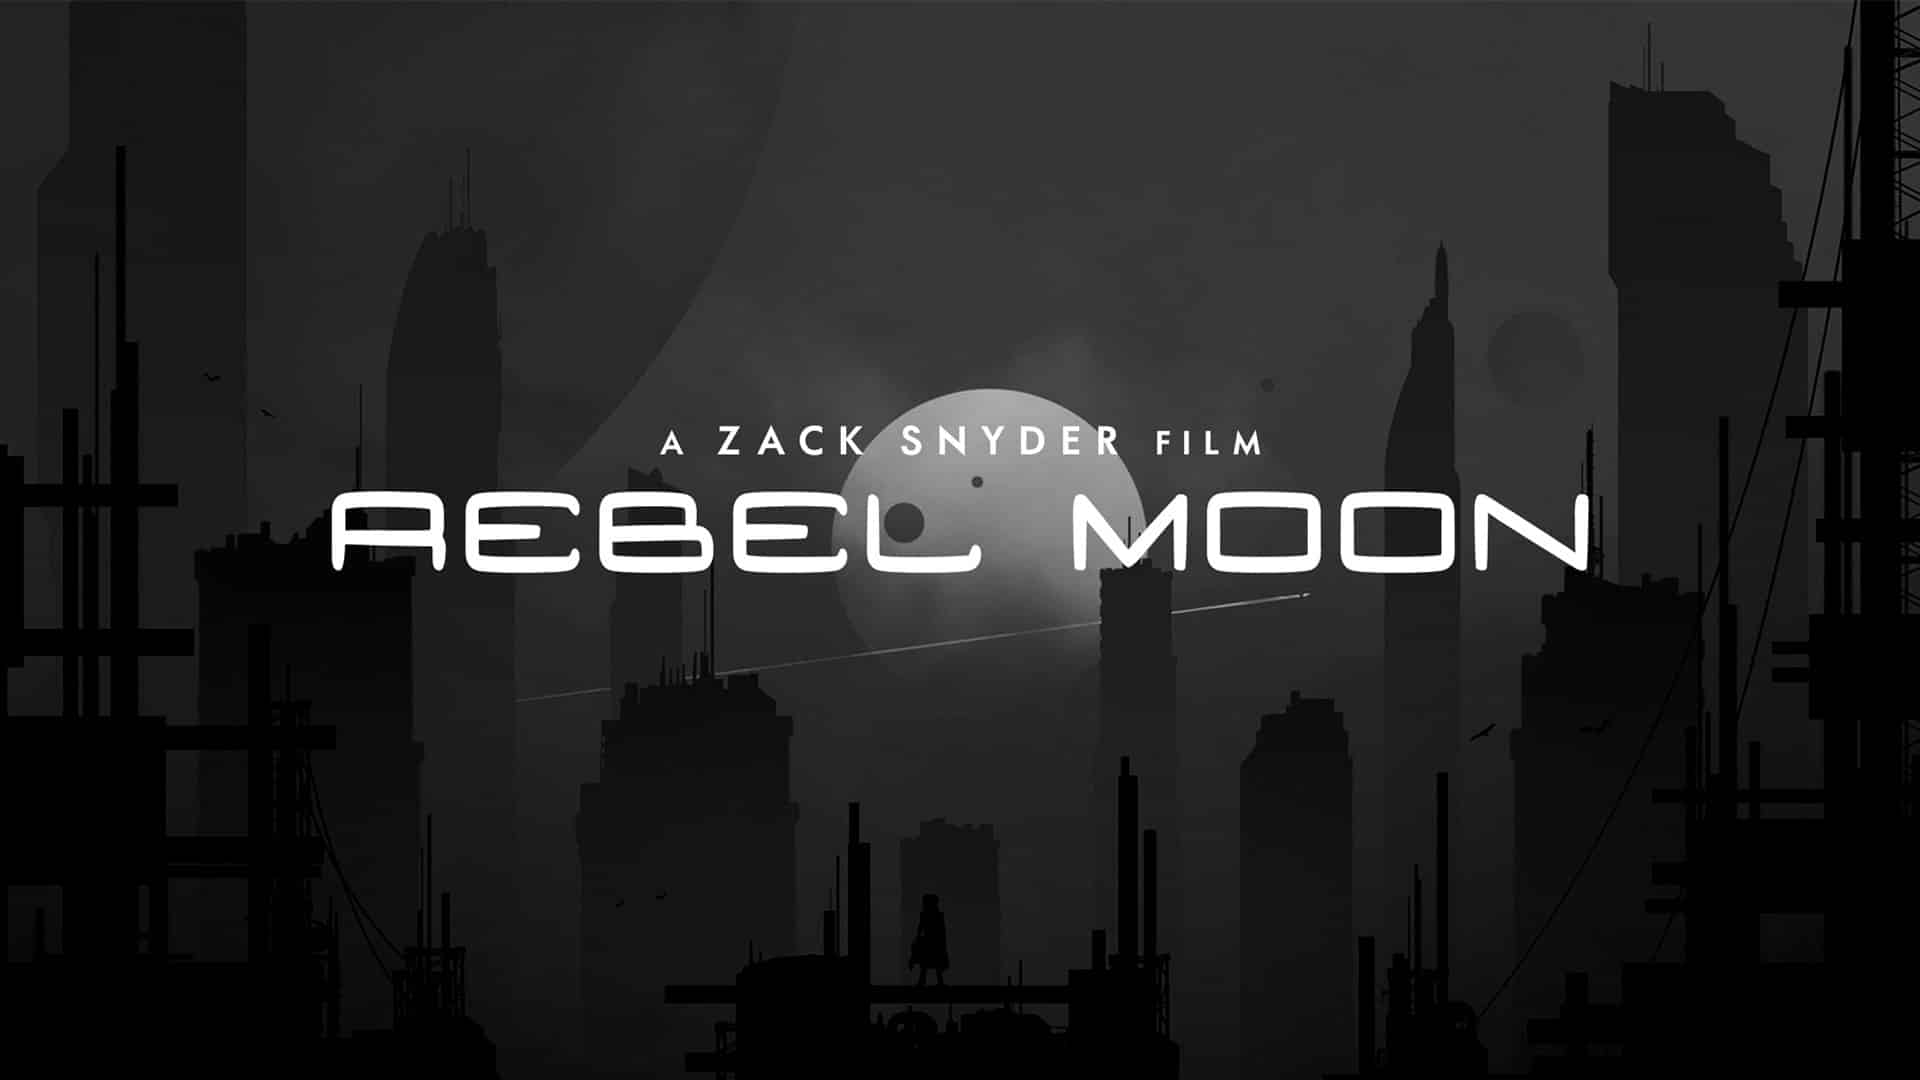 zack snyder rebel moon